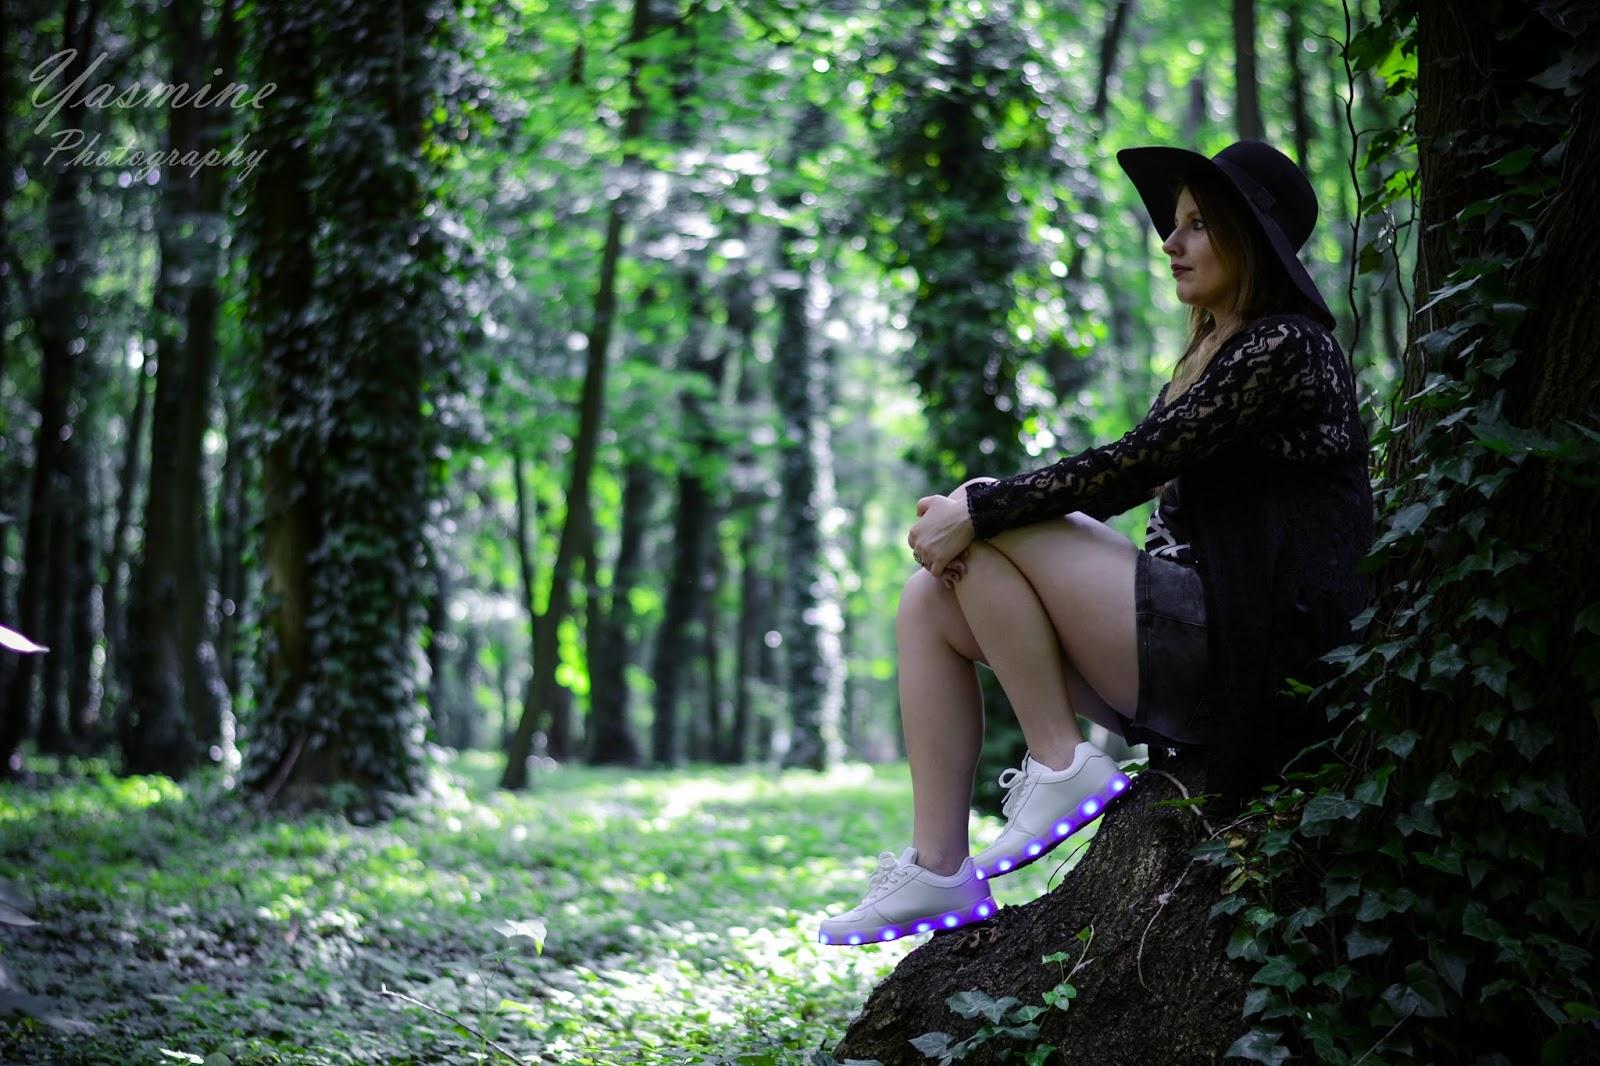 renee shoes lato z renee white sneakers disco lights biale buty z diodami led. melodylaniella